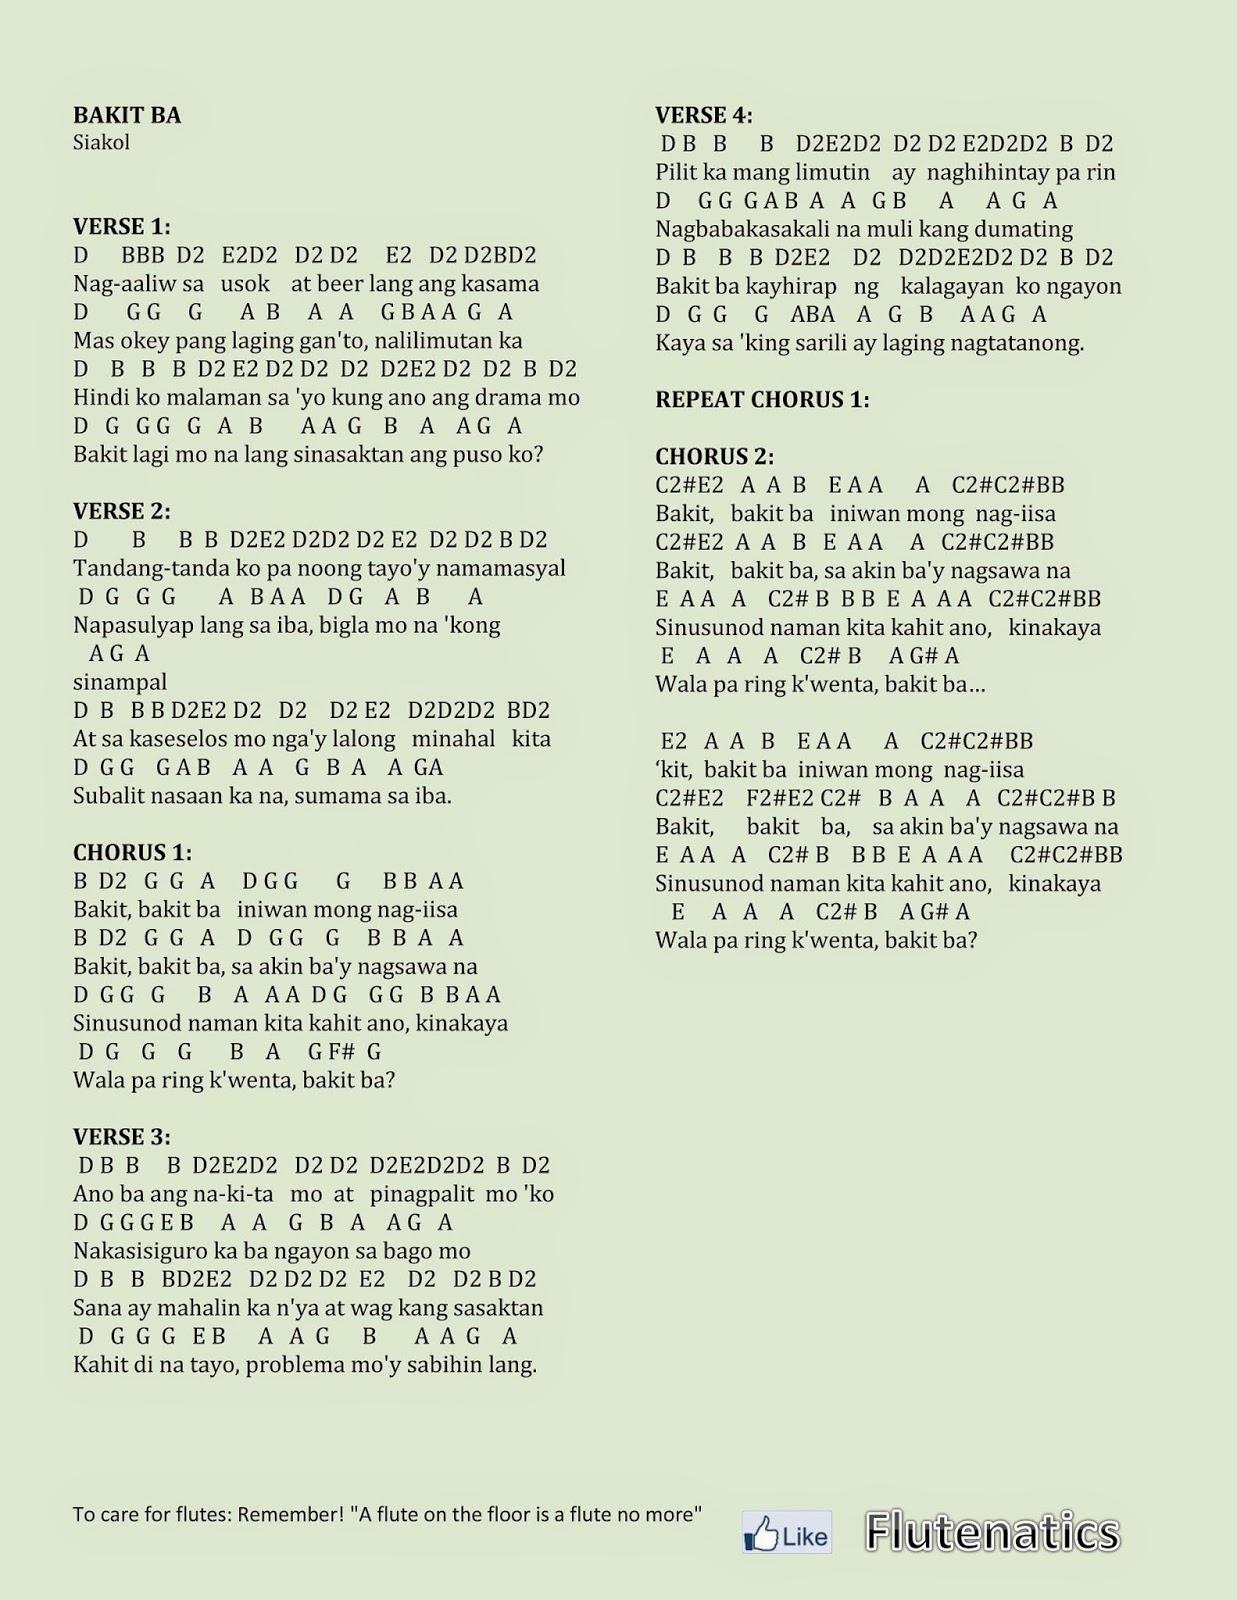 Bakit lyrics and chords